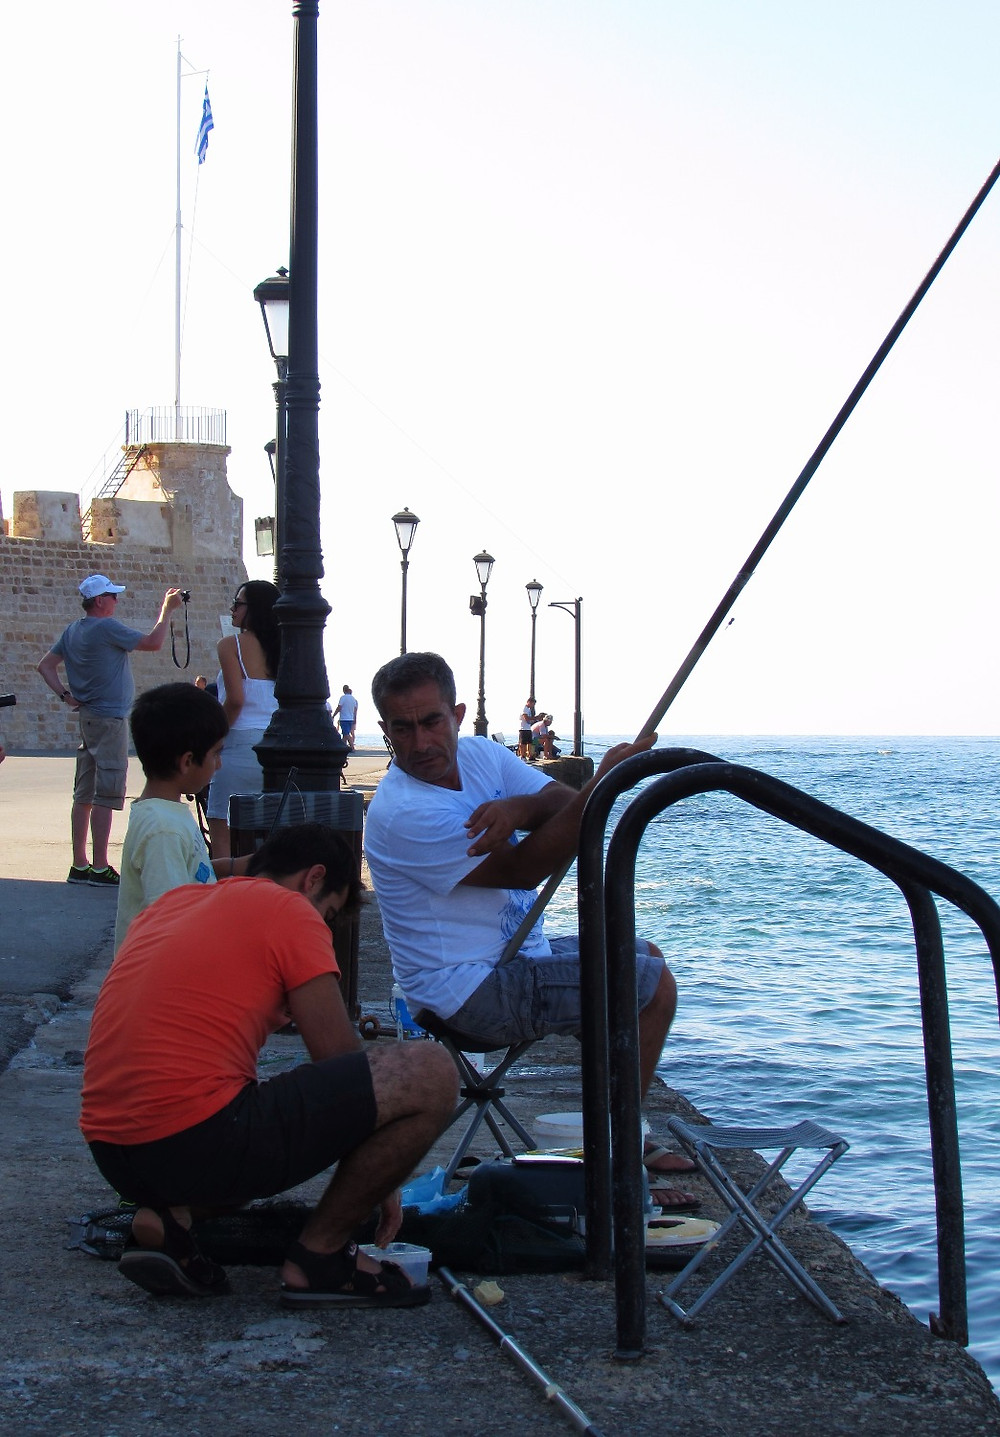 Сын, отец и дедушка ловят рыбу